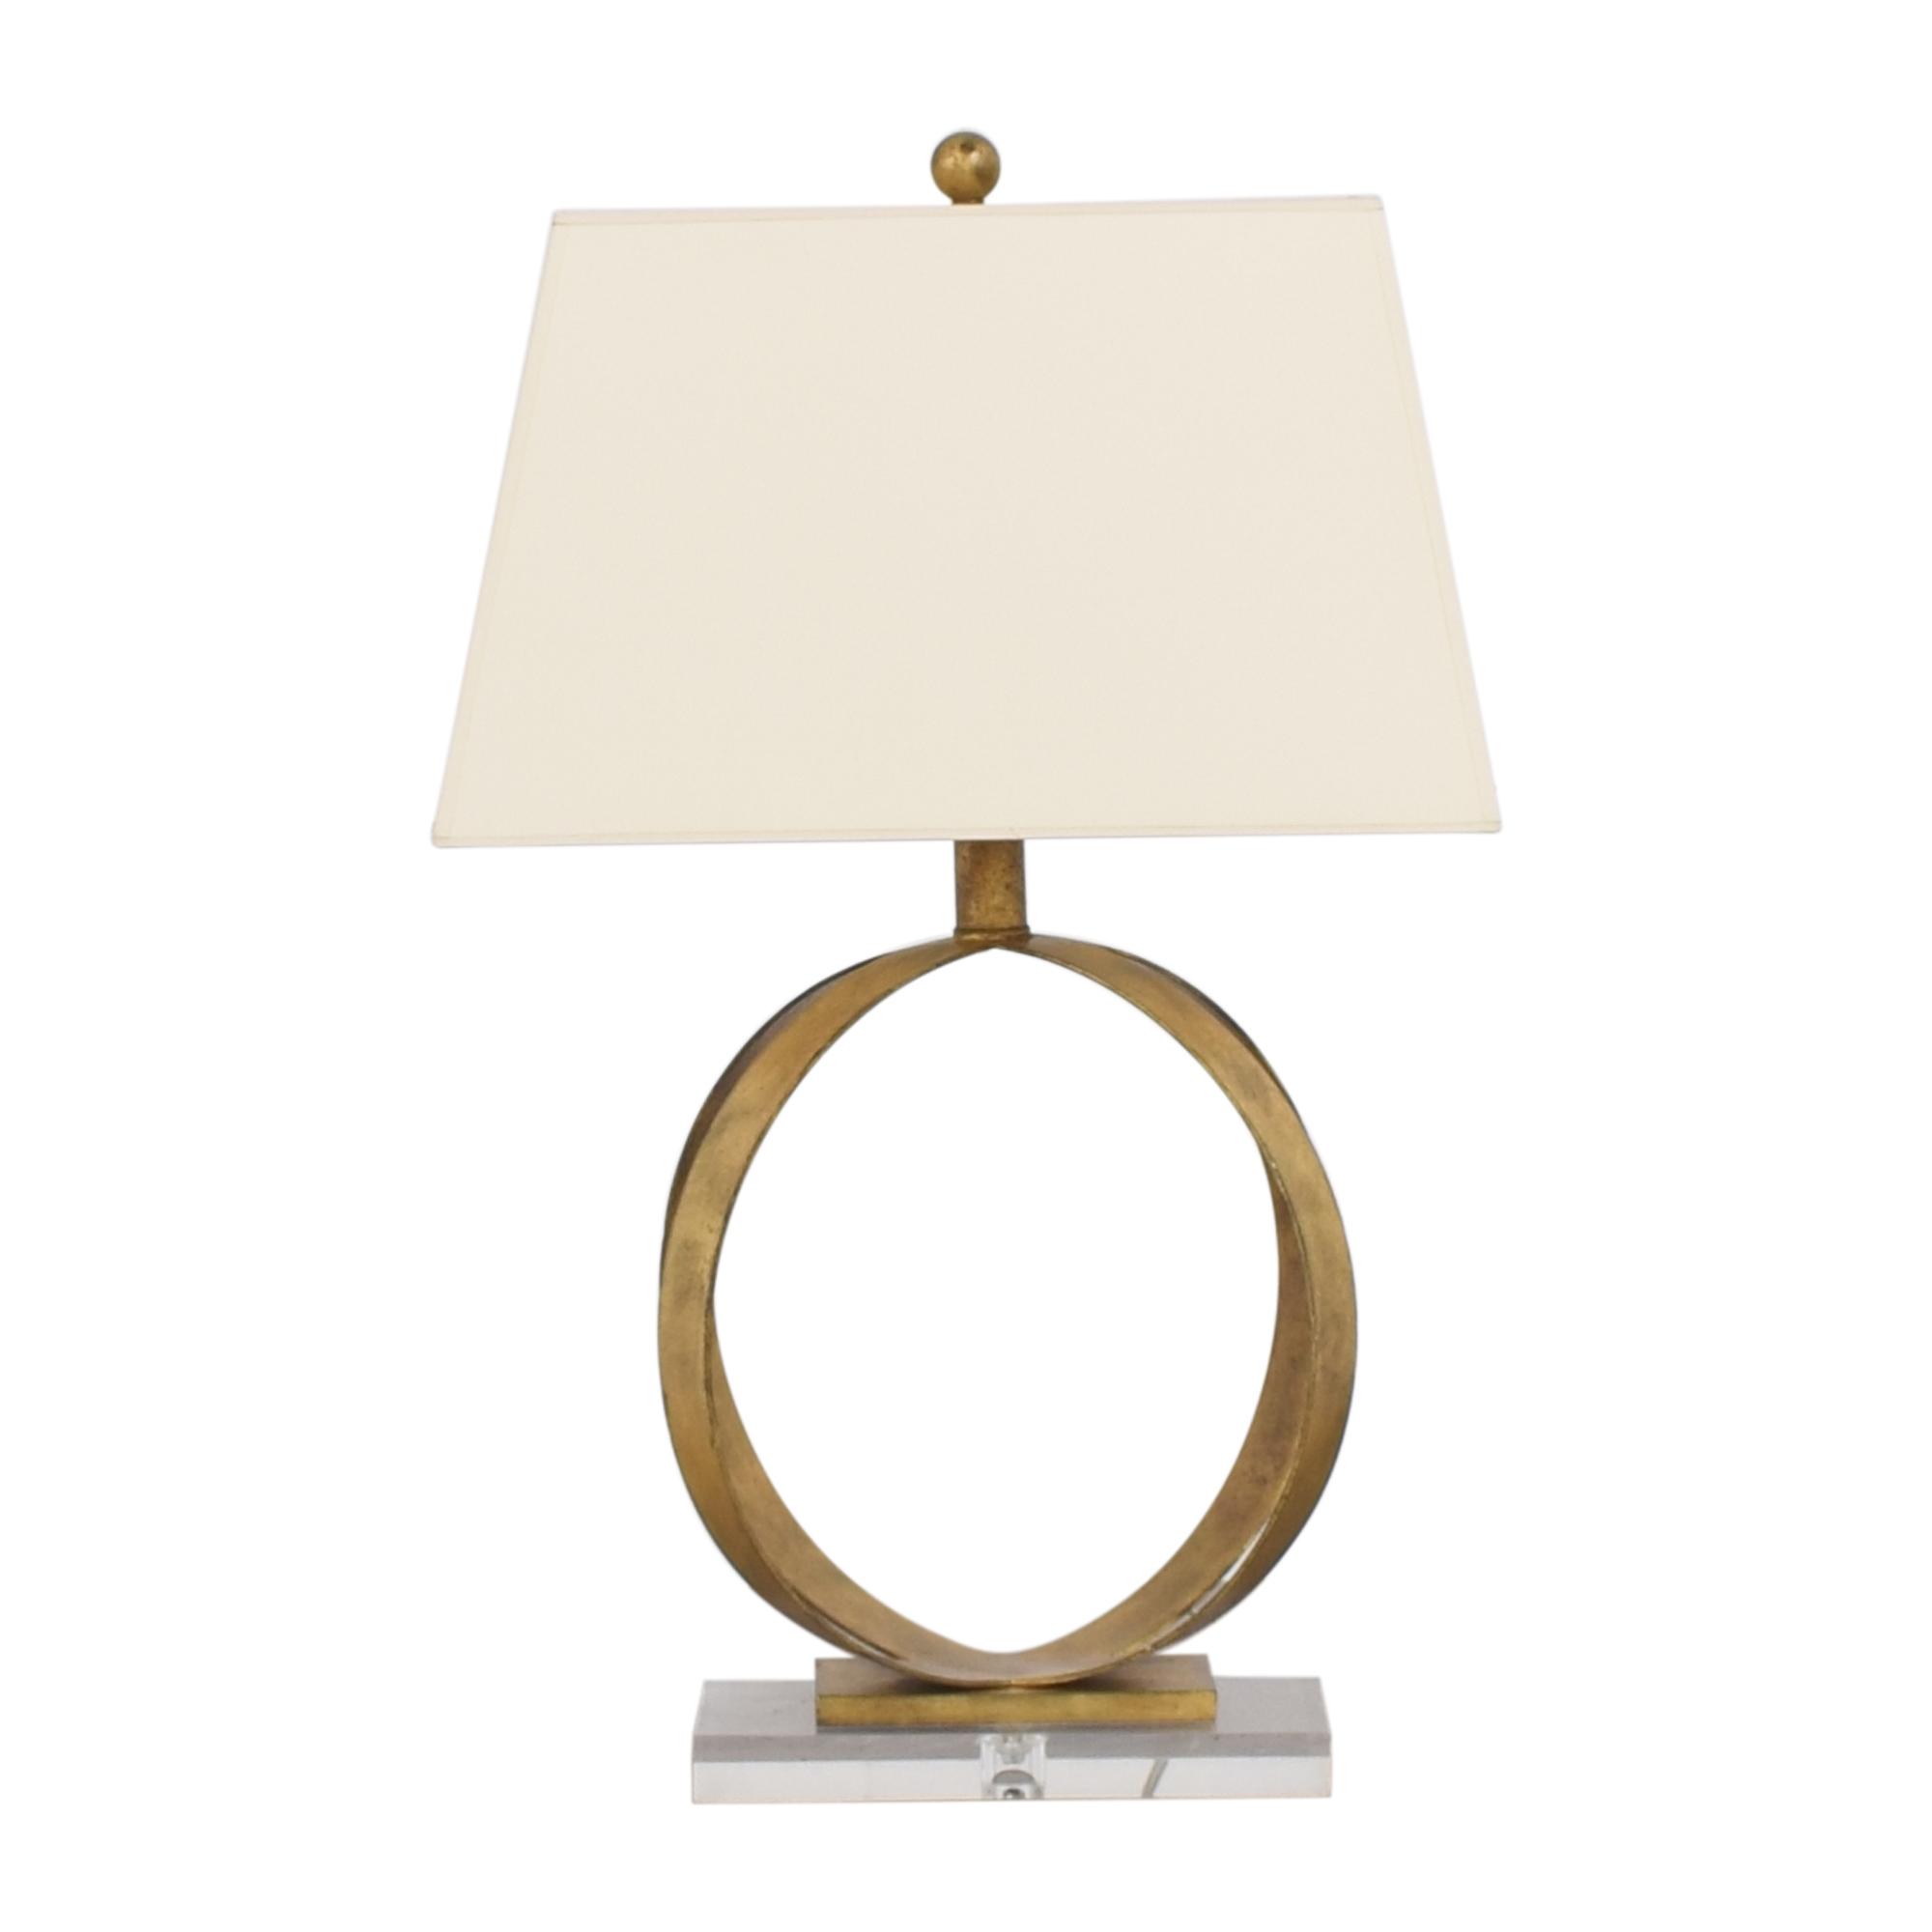 Visual Comfort E.F. Chapman Rings Table Lamp / Lamps